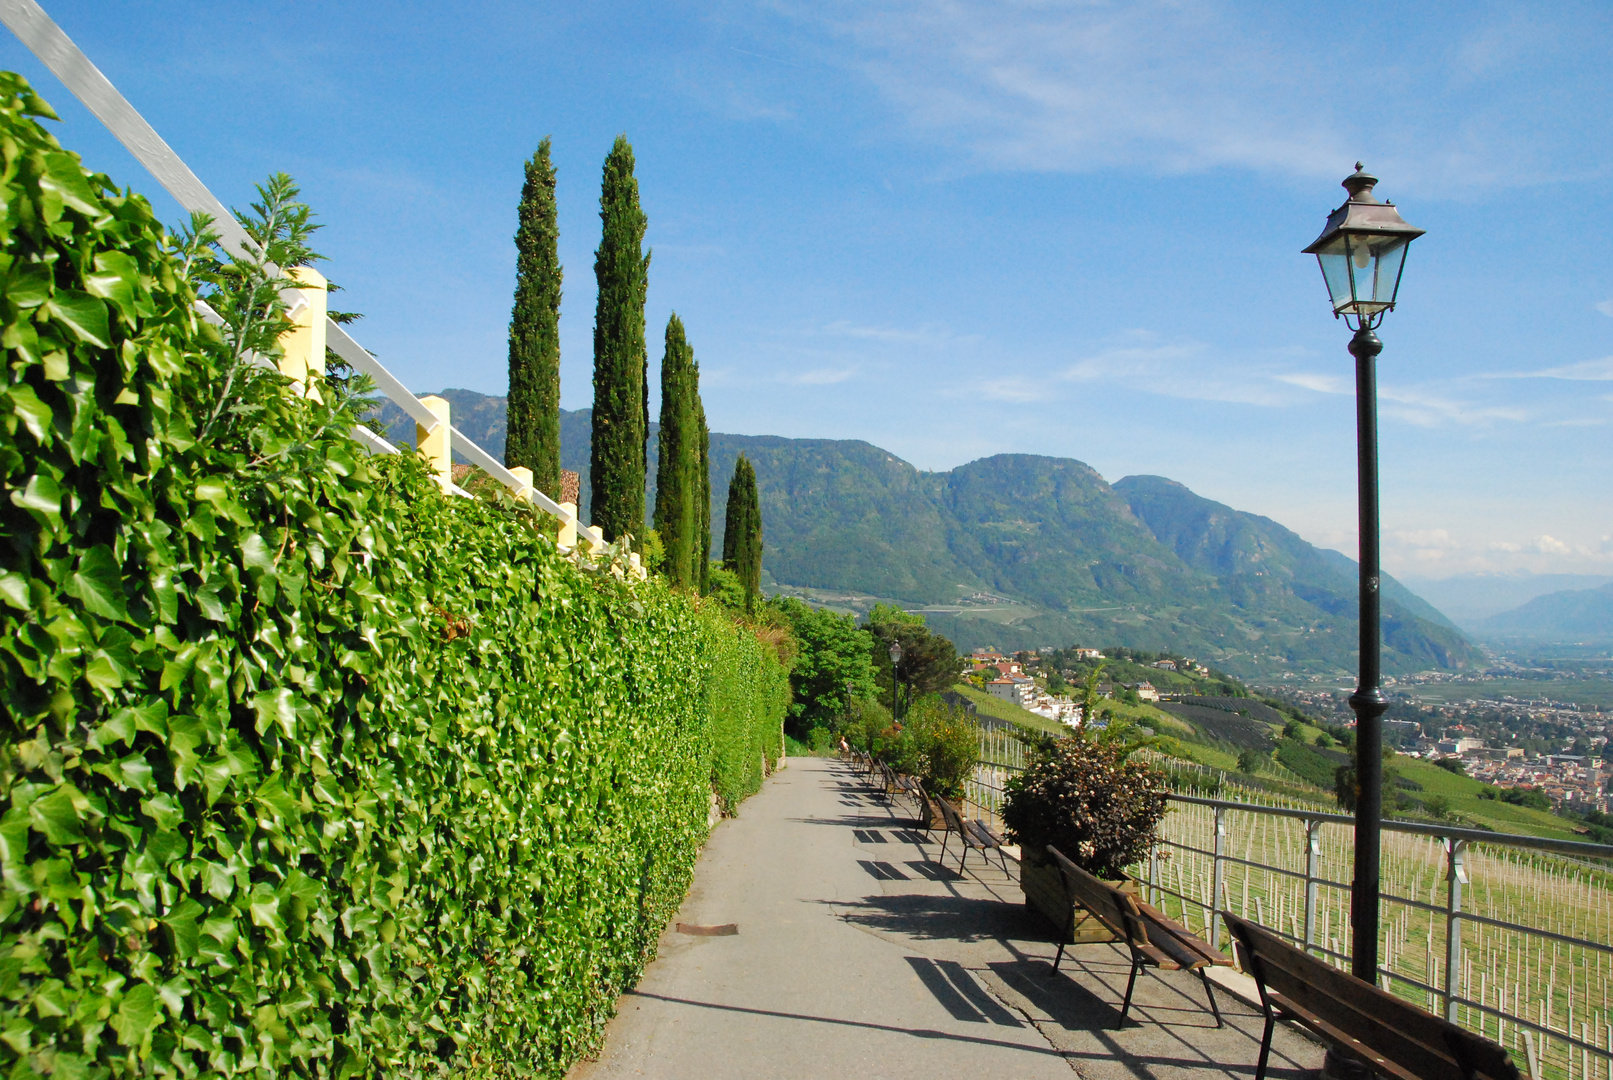 Dorf Tirol, 36°